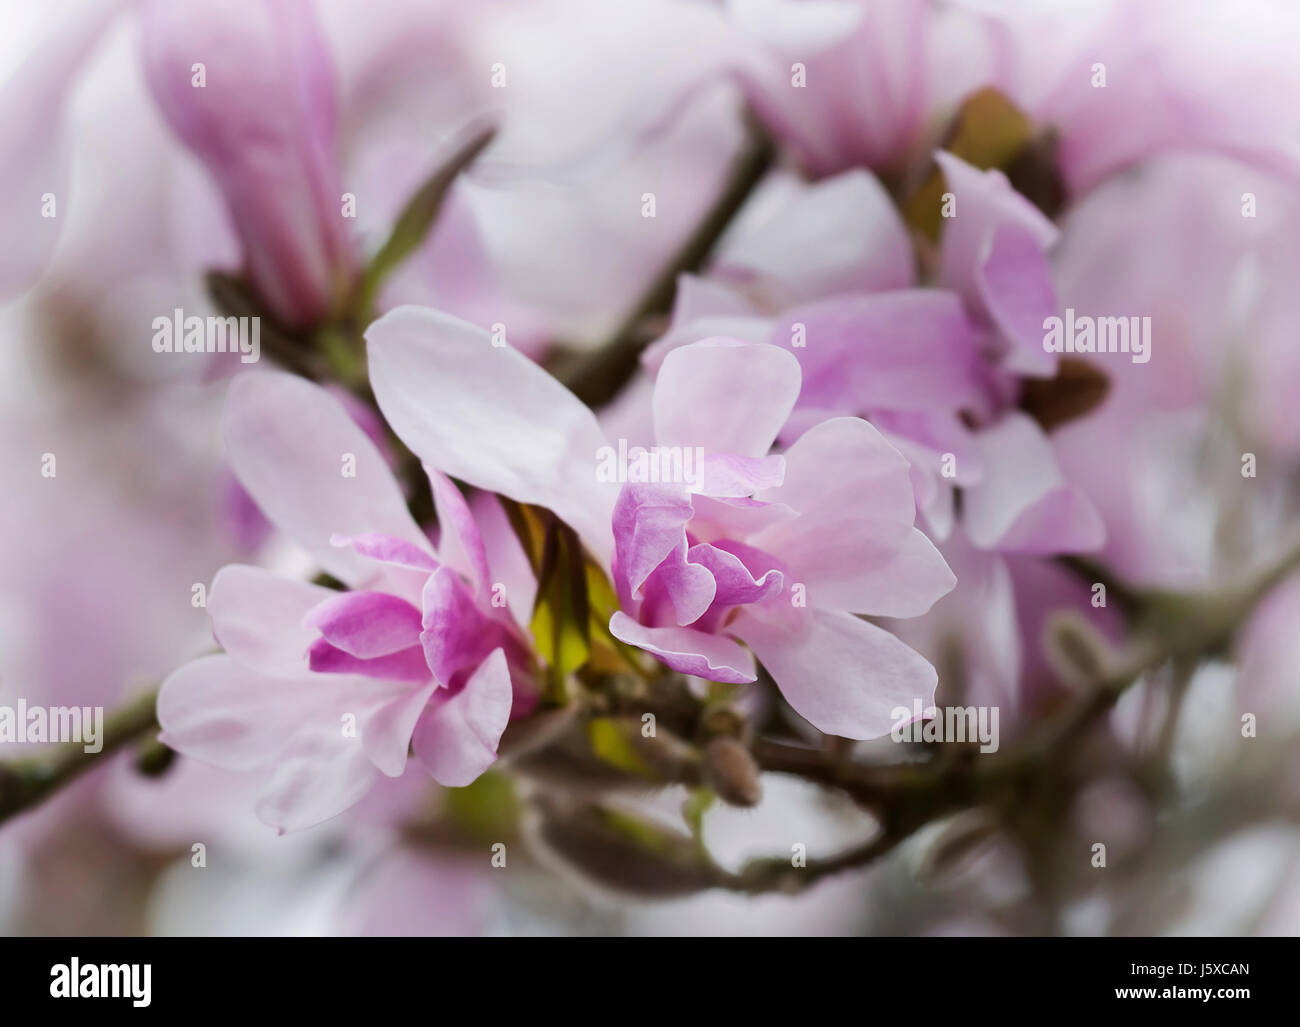 Magnolia, Magnolia 'Leonard Messel', Magnolia x loebneri 'Leonard Messel', Pastel pink flowers growing outdoor on Stock Photo